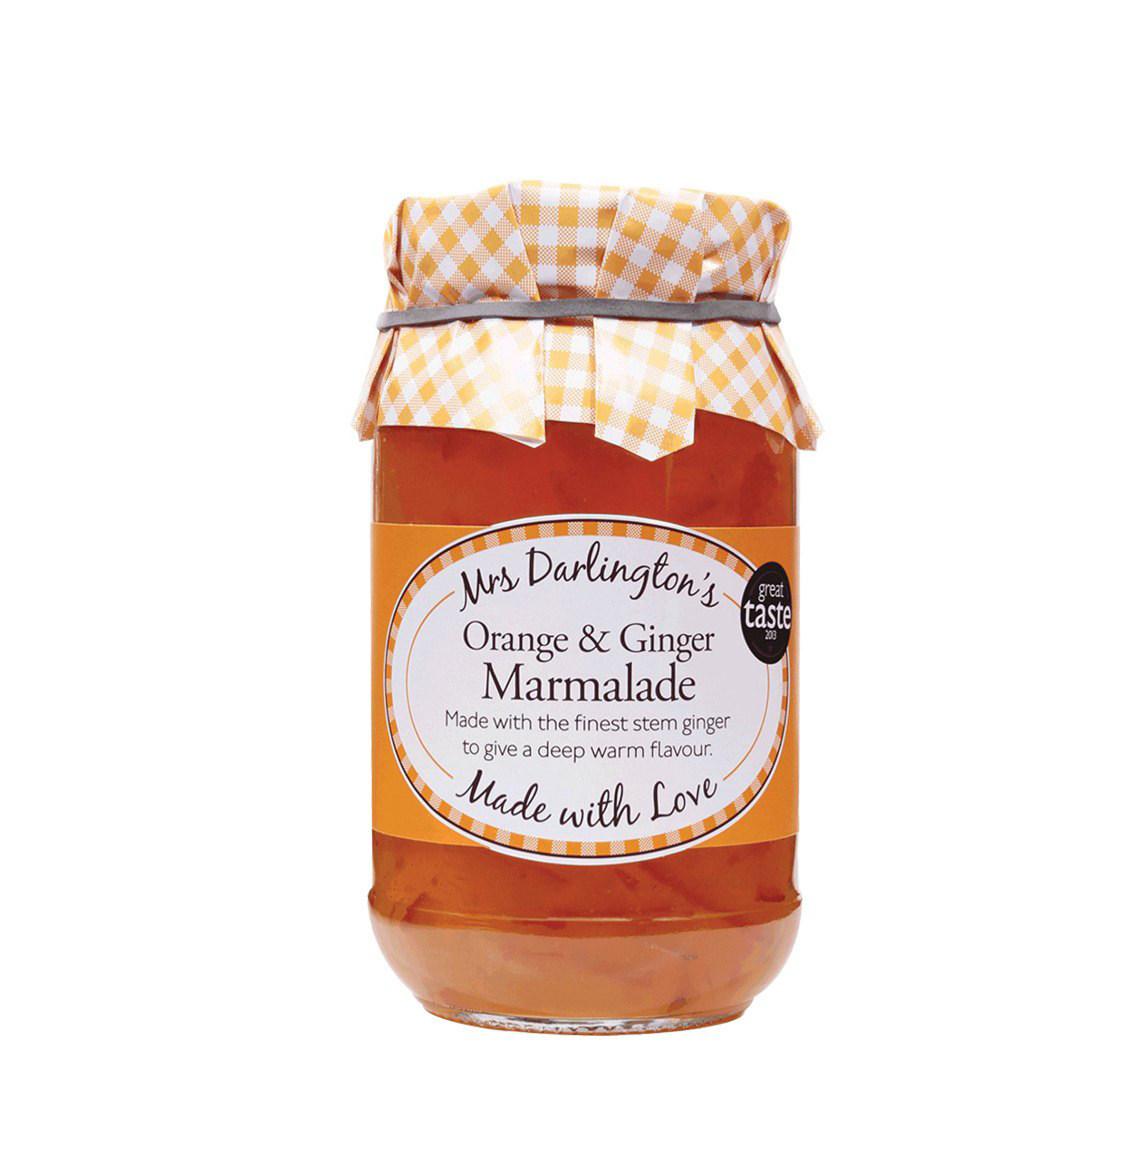 Mrs Darlington's Μαρμελάδα Πορτοκαλιού και Πιπερόριζας